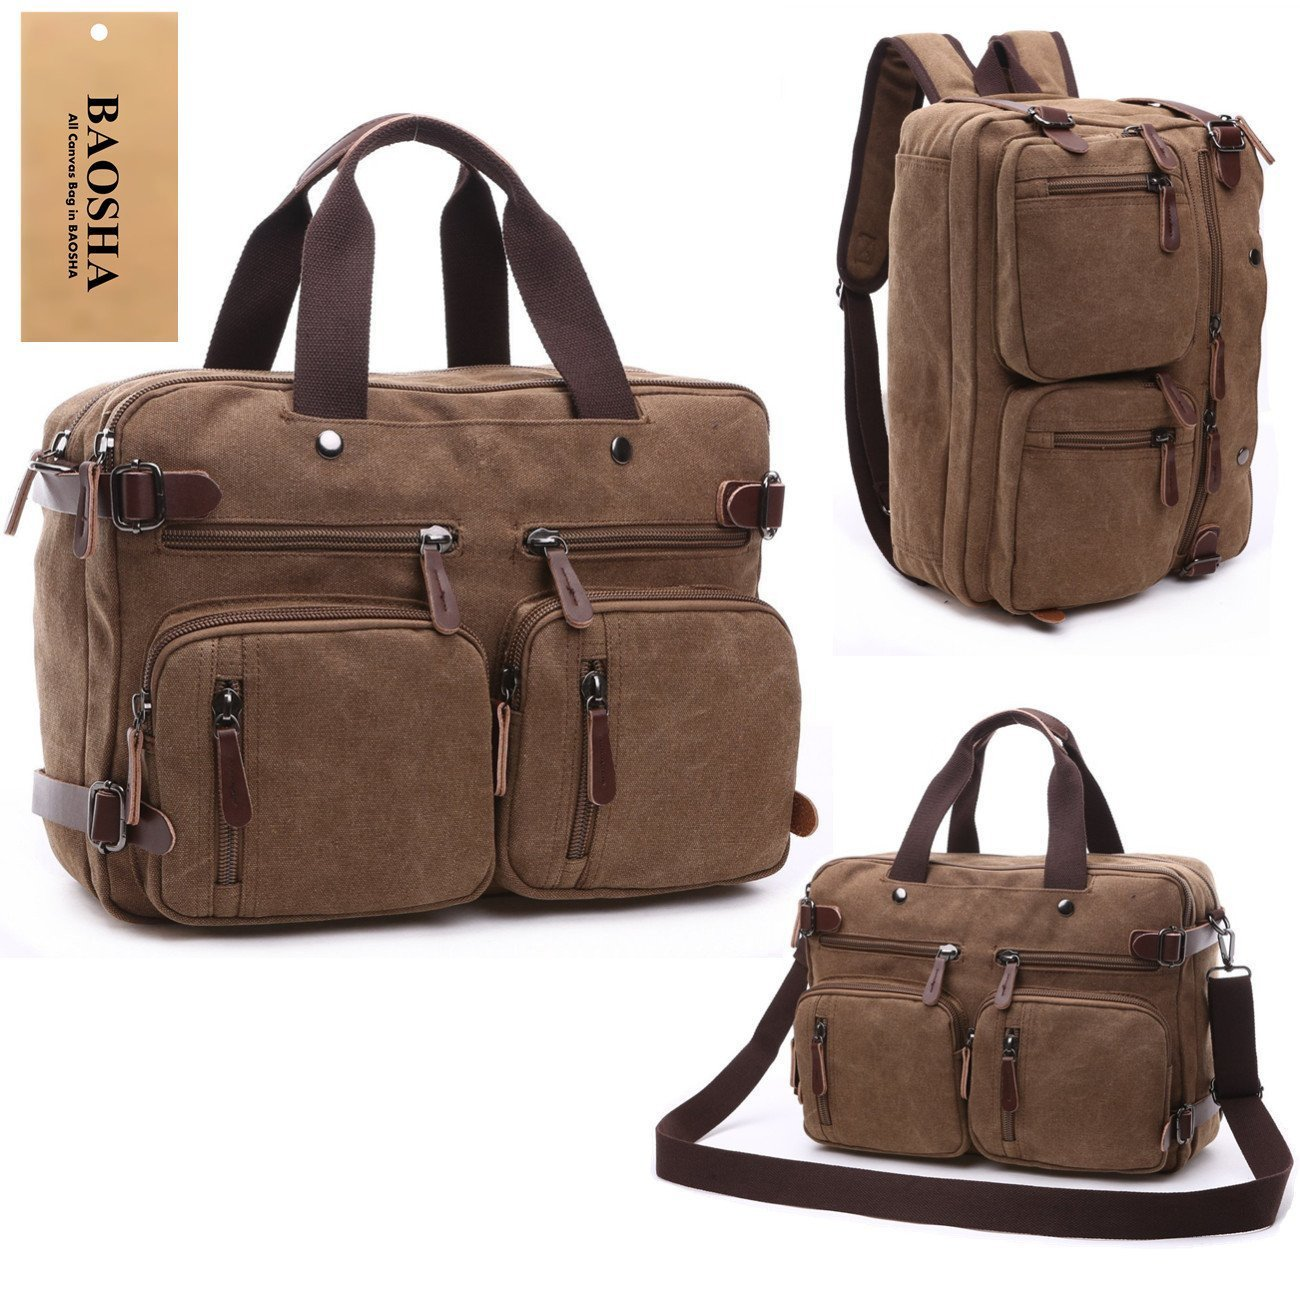 BAOSHA HB-22 Vintage lienzo bolso de mano hombres del maletín mochila Convertible bolsa de ordenador portátil mochila de viaje senderismo mochila marrón ...